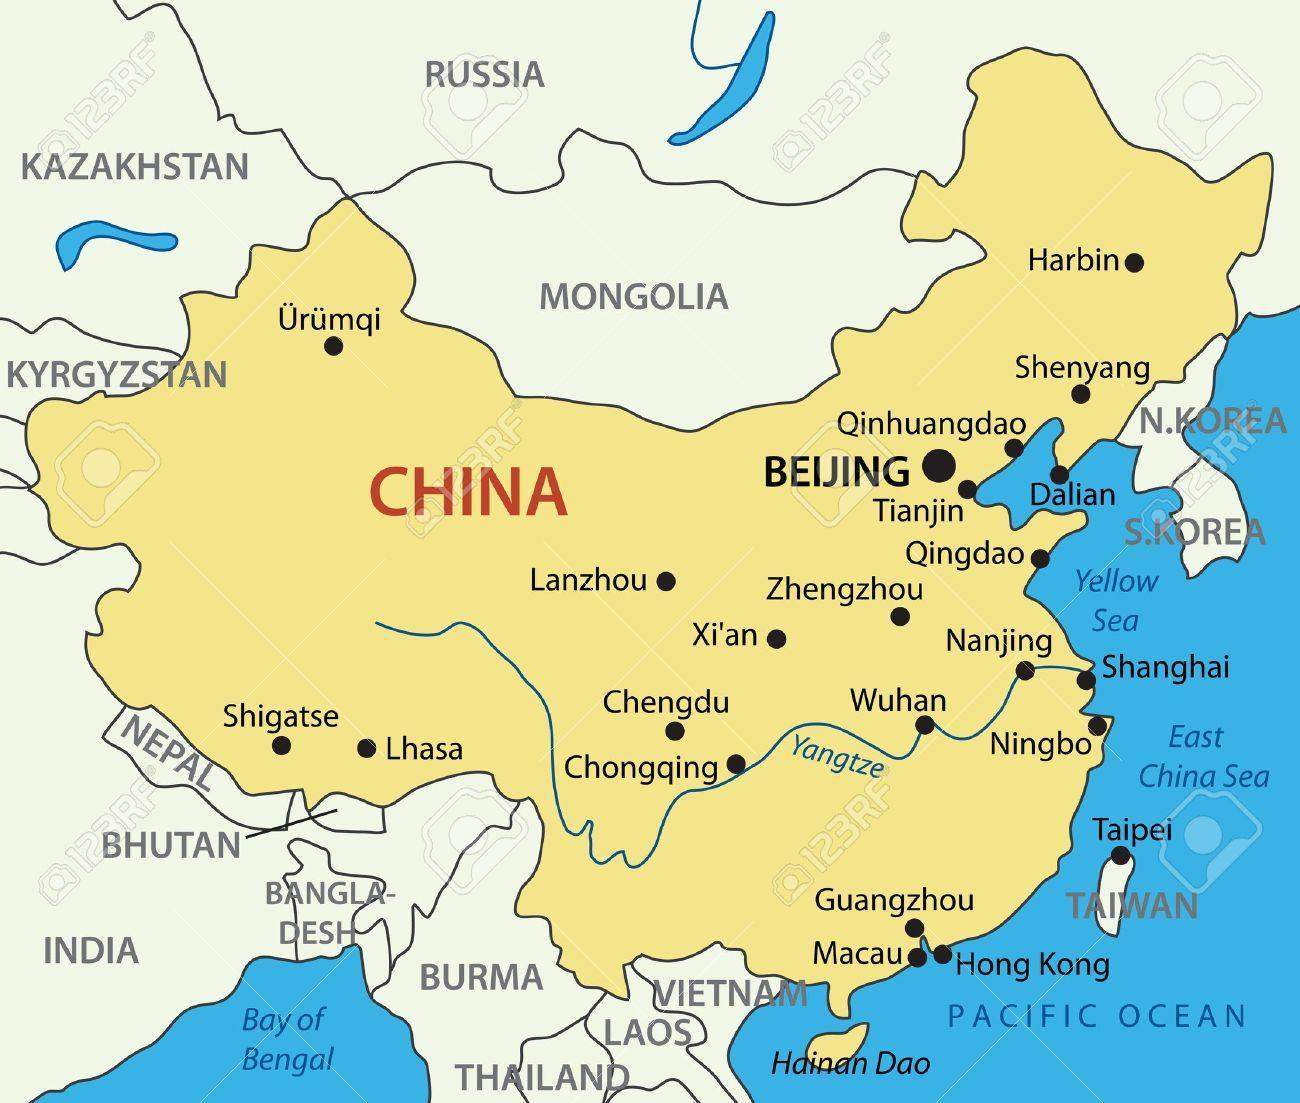 kart taiwan Hong Kong Taiwan kart   Kart over Taiwan og Hong Kong (Kina) kart taiwan